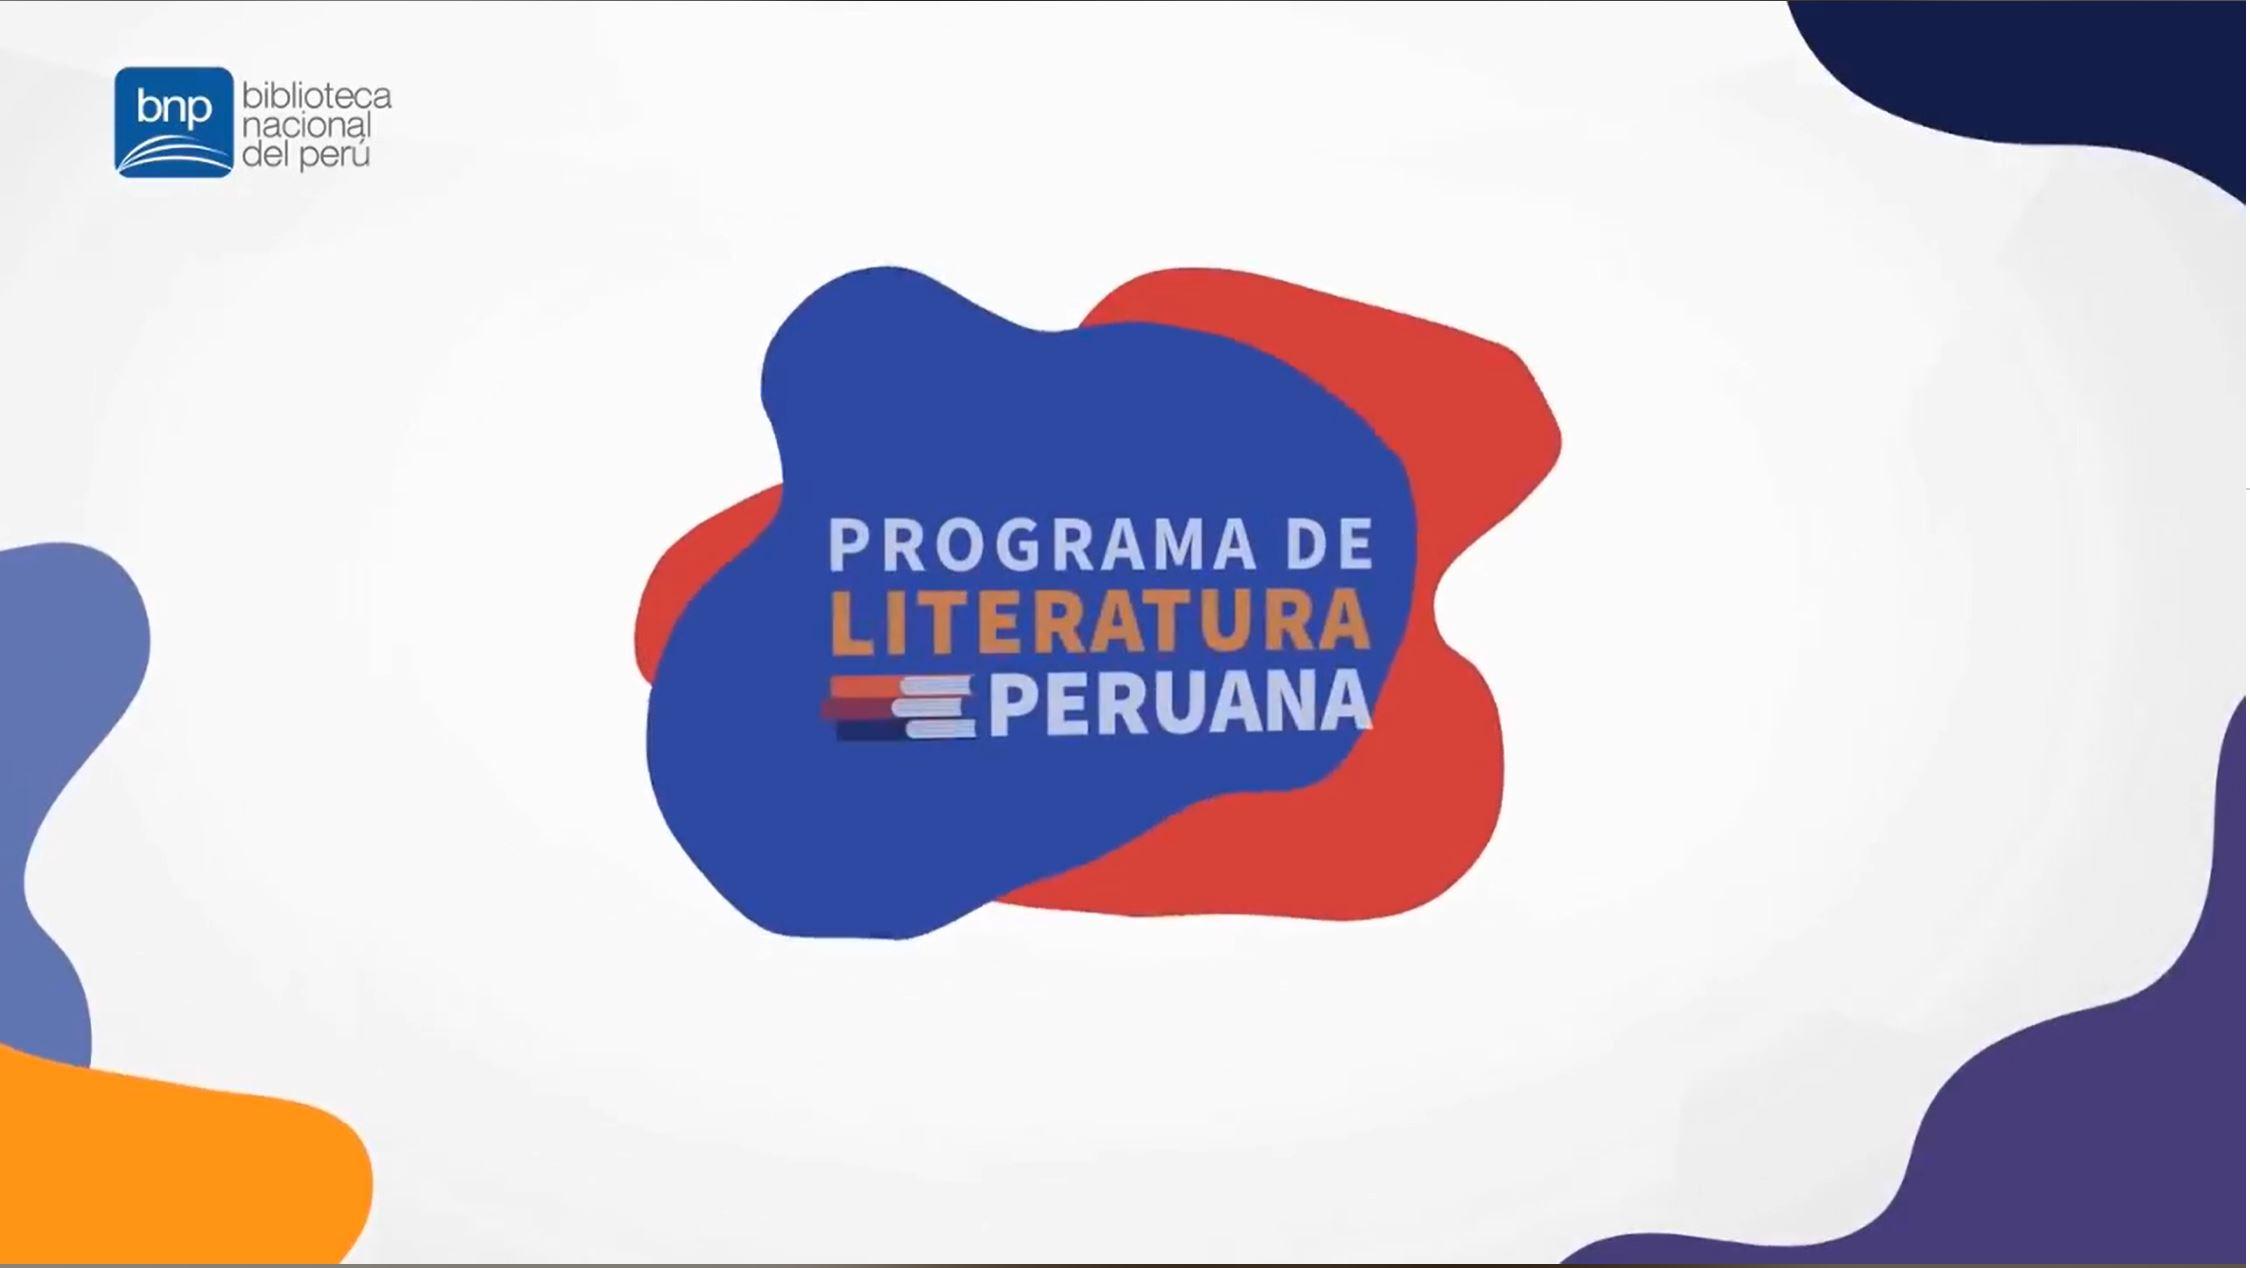 Biblioteca Nacional del Perú: Programa de Literatura Peruana [videos]